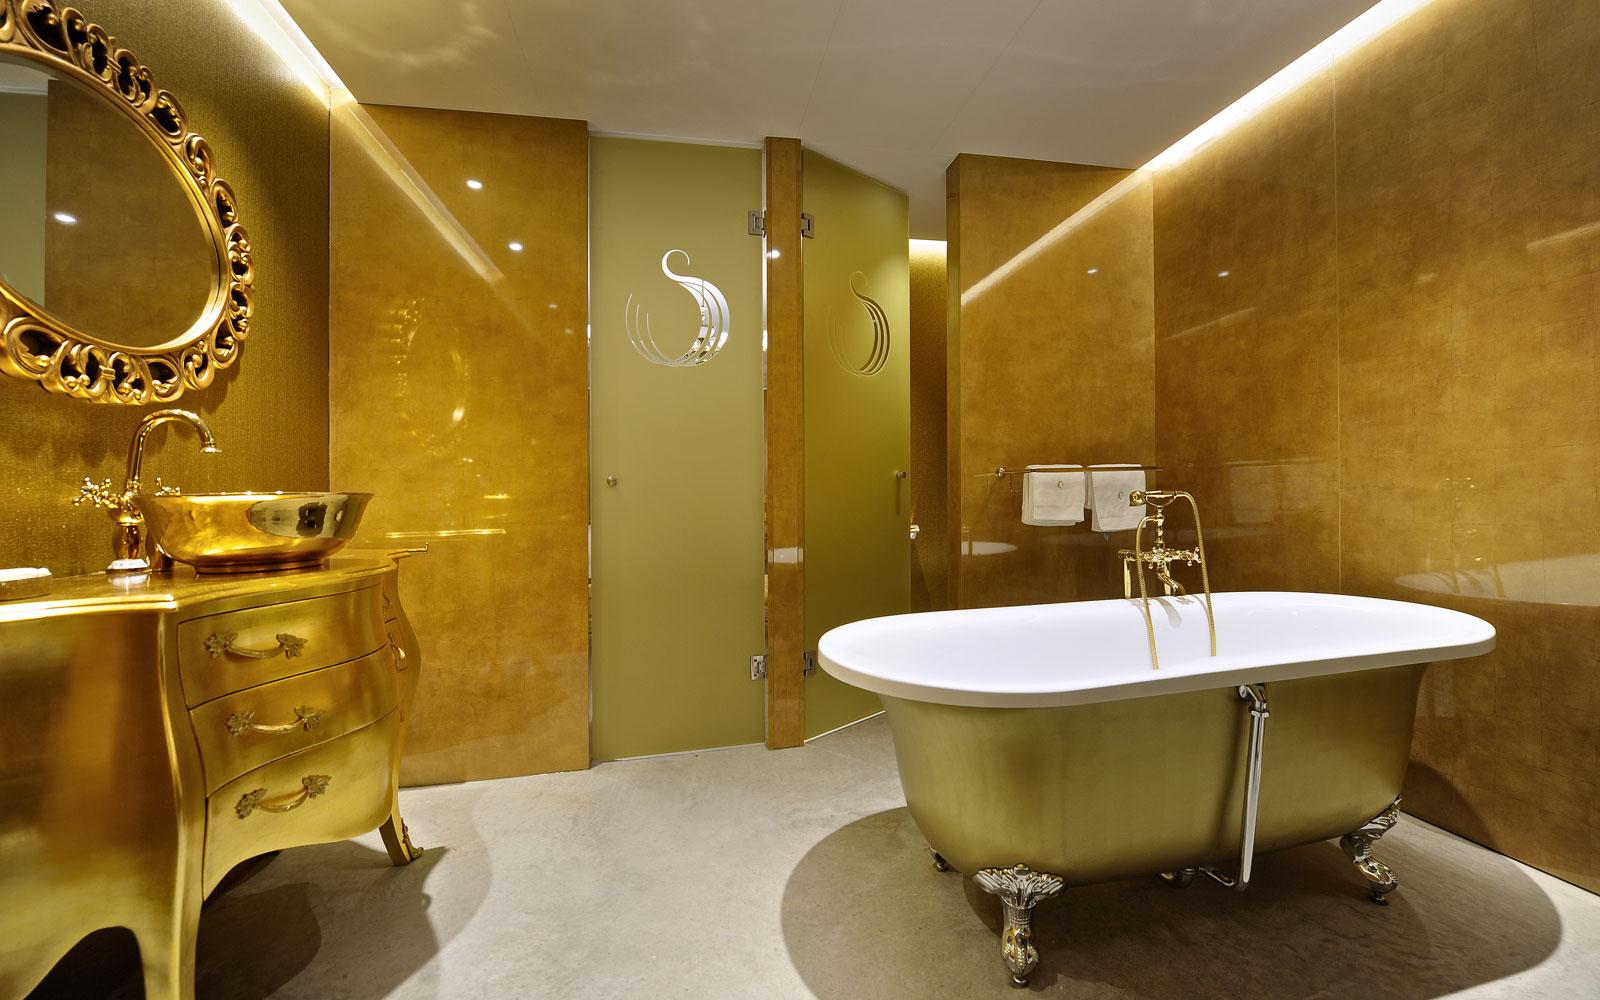 Badkamer, goud, vrijstaand bad, wastafel, La Marquise, Hertroijs Architekten